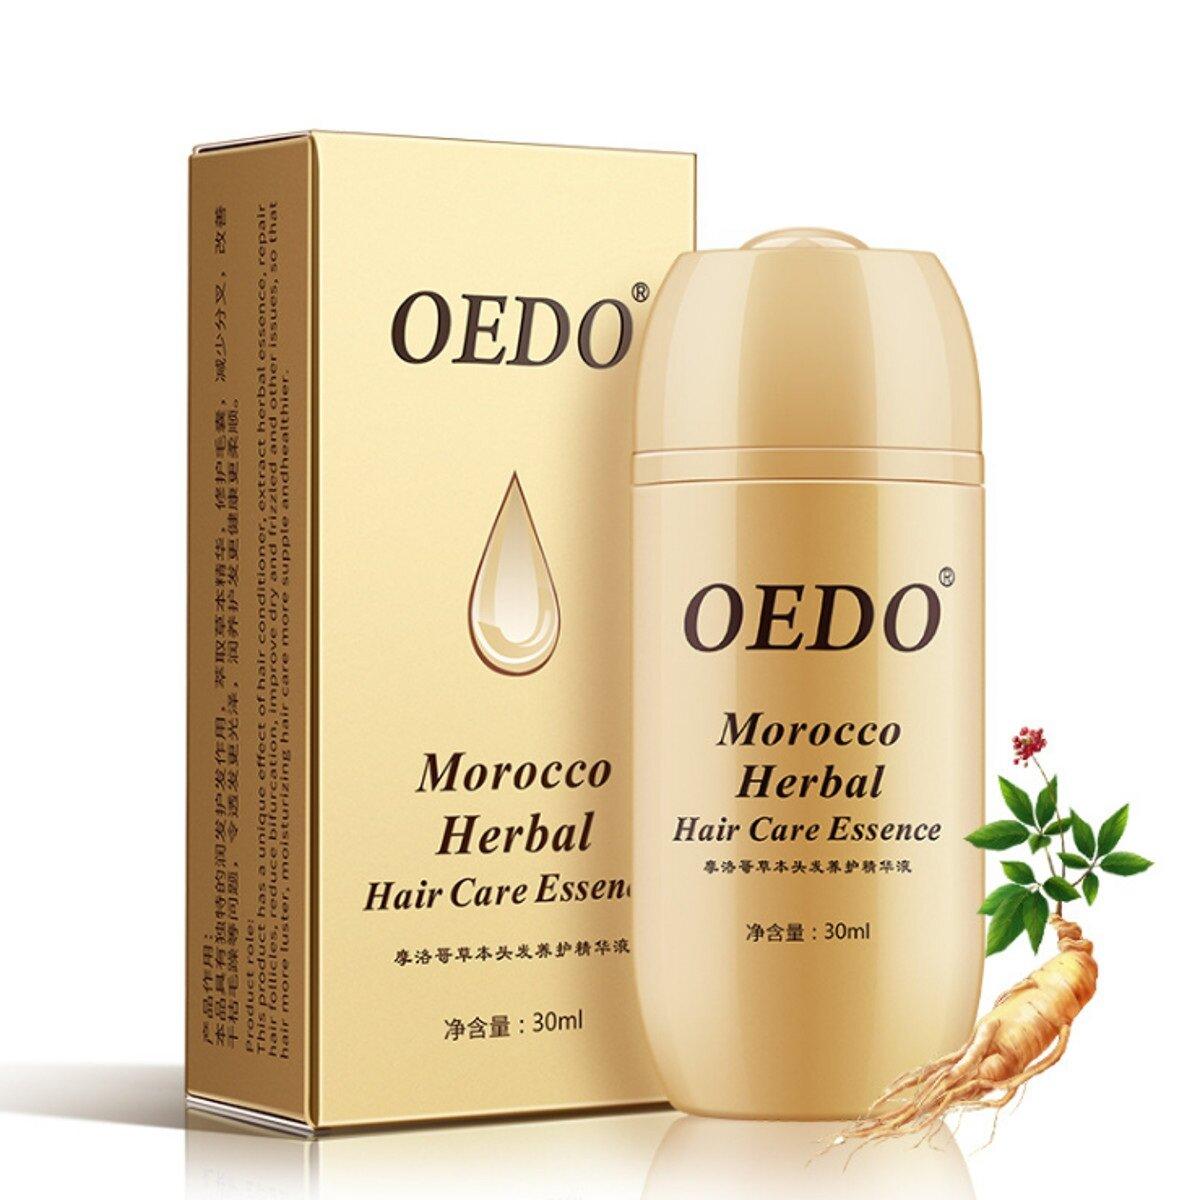 OEDO Morocco Hair Care Essence Loss Treatment Men Women Fast Regrowth